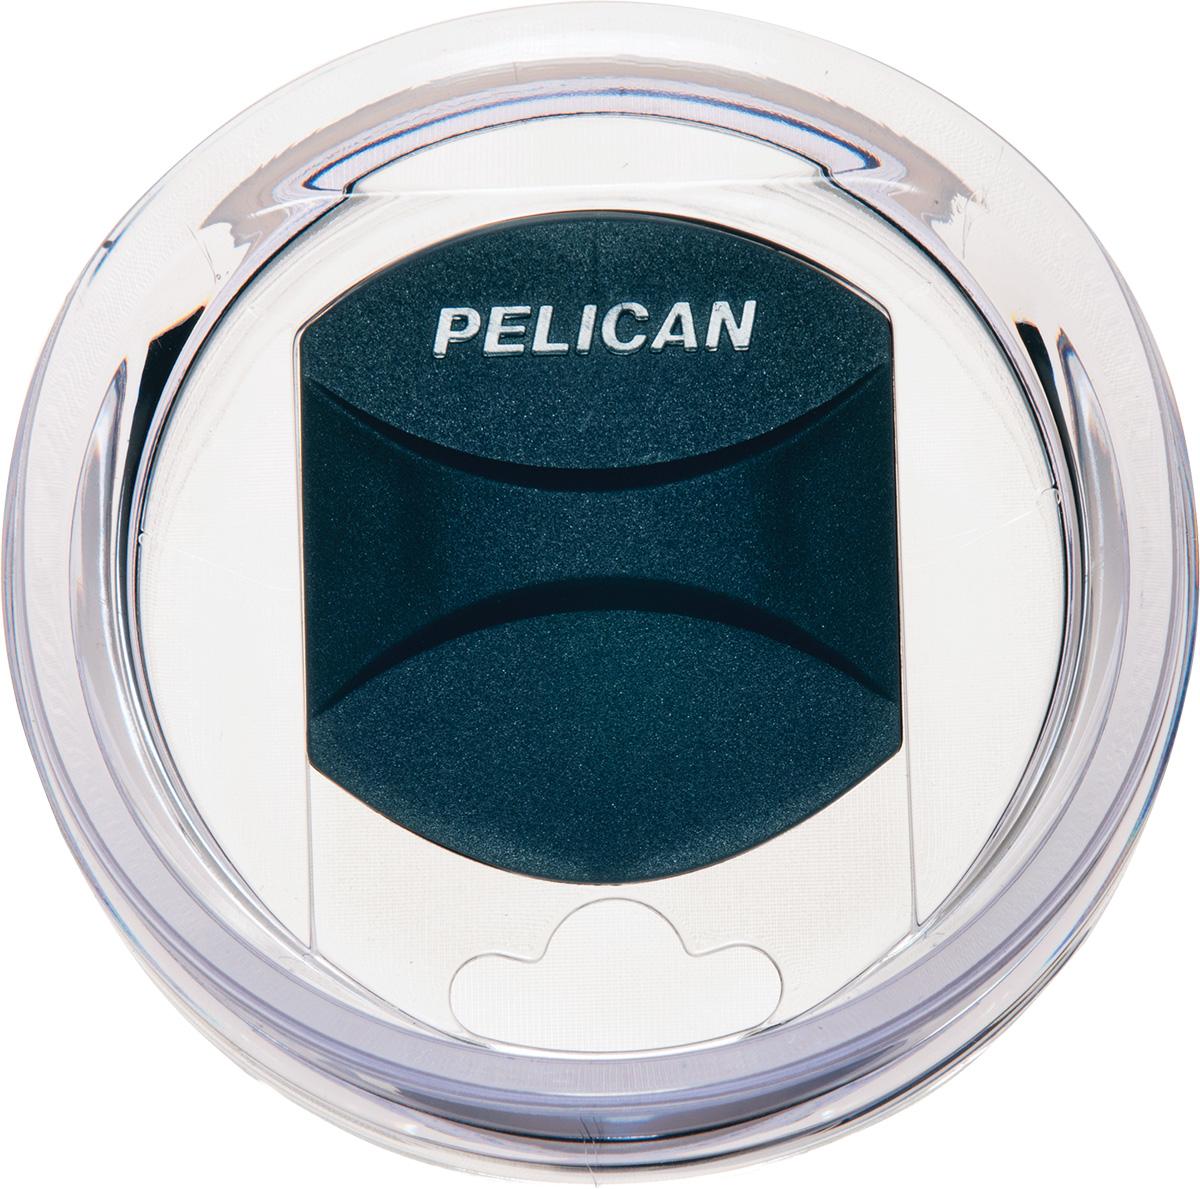 pelican slide lid travel mug tumbler traveller